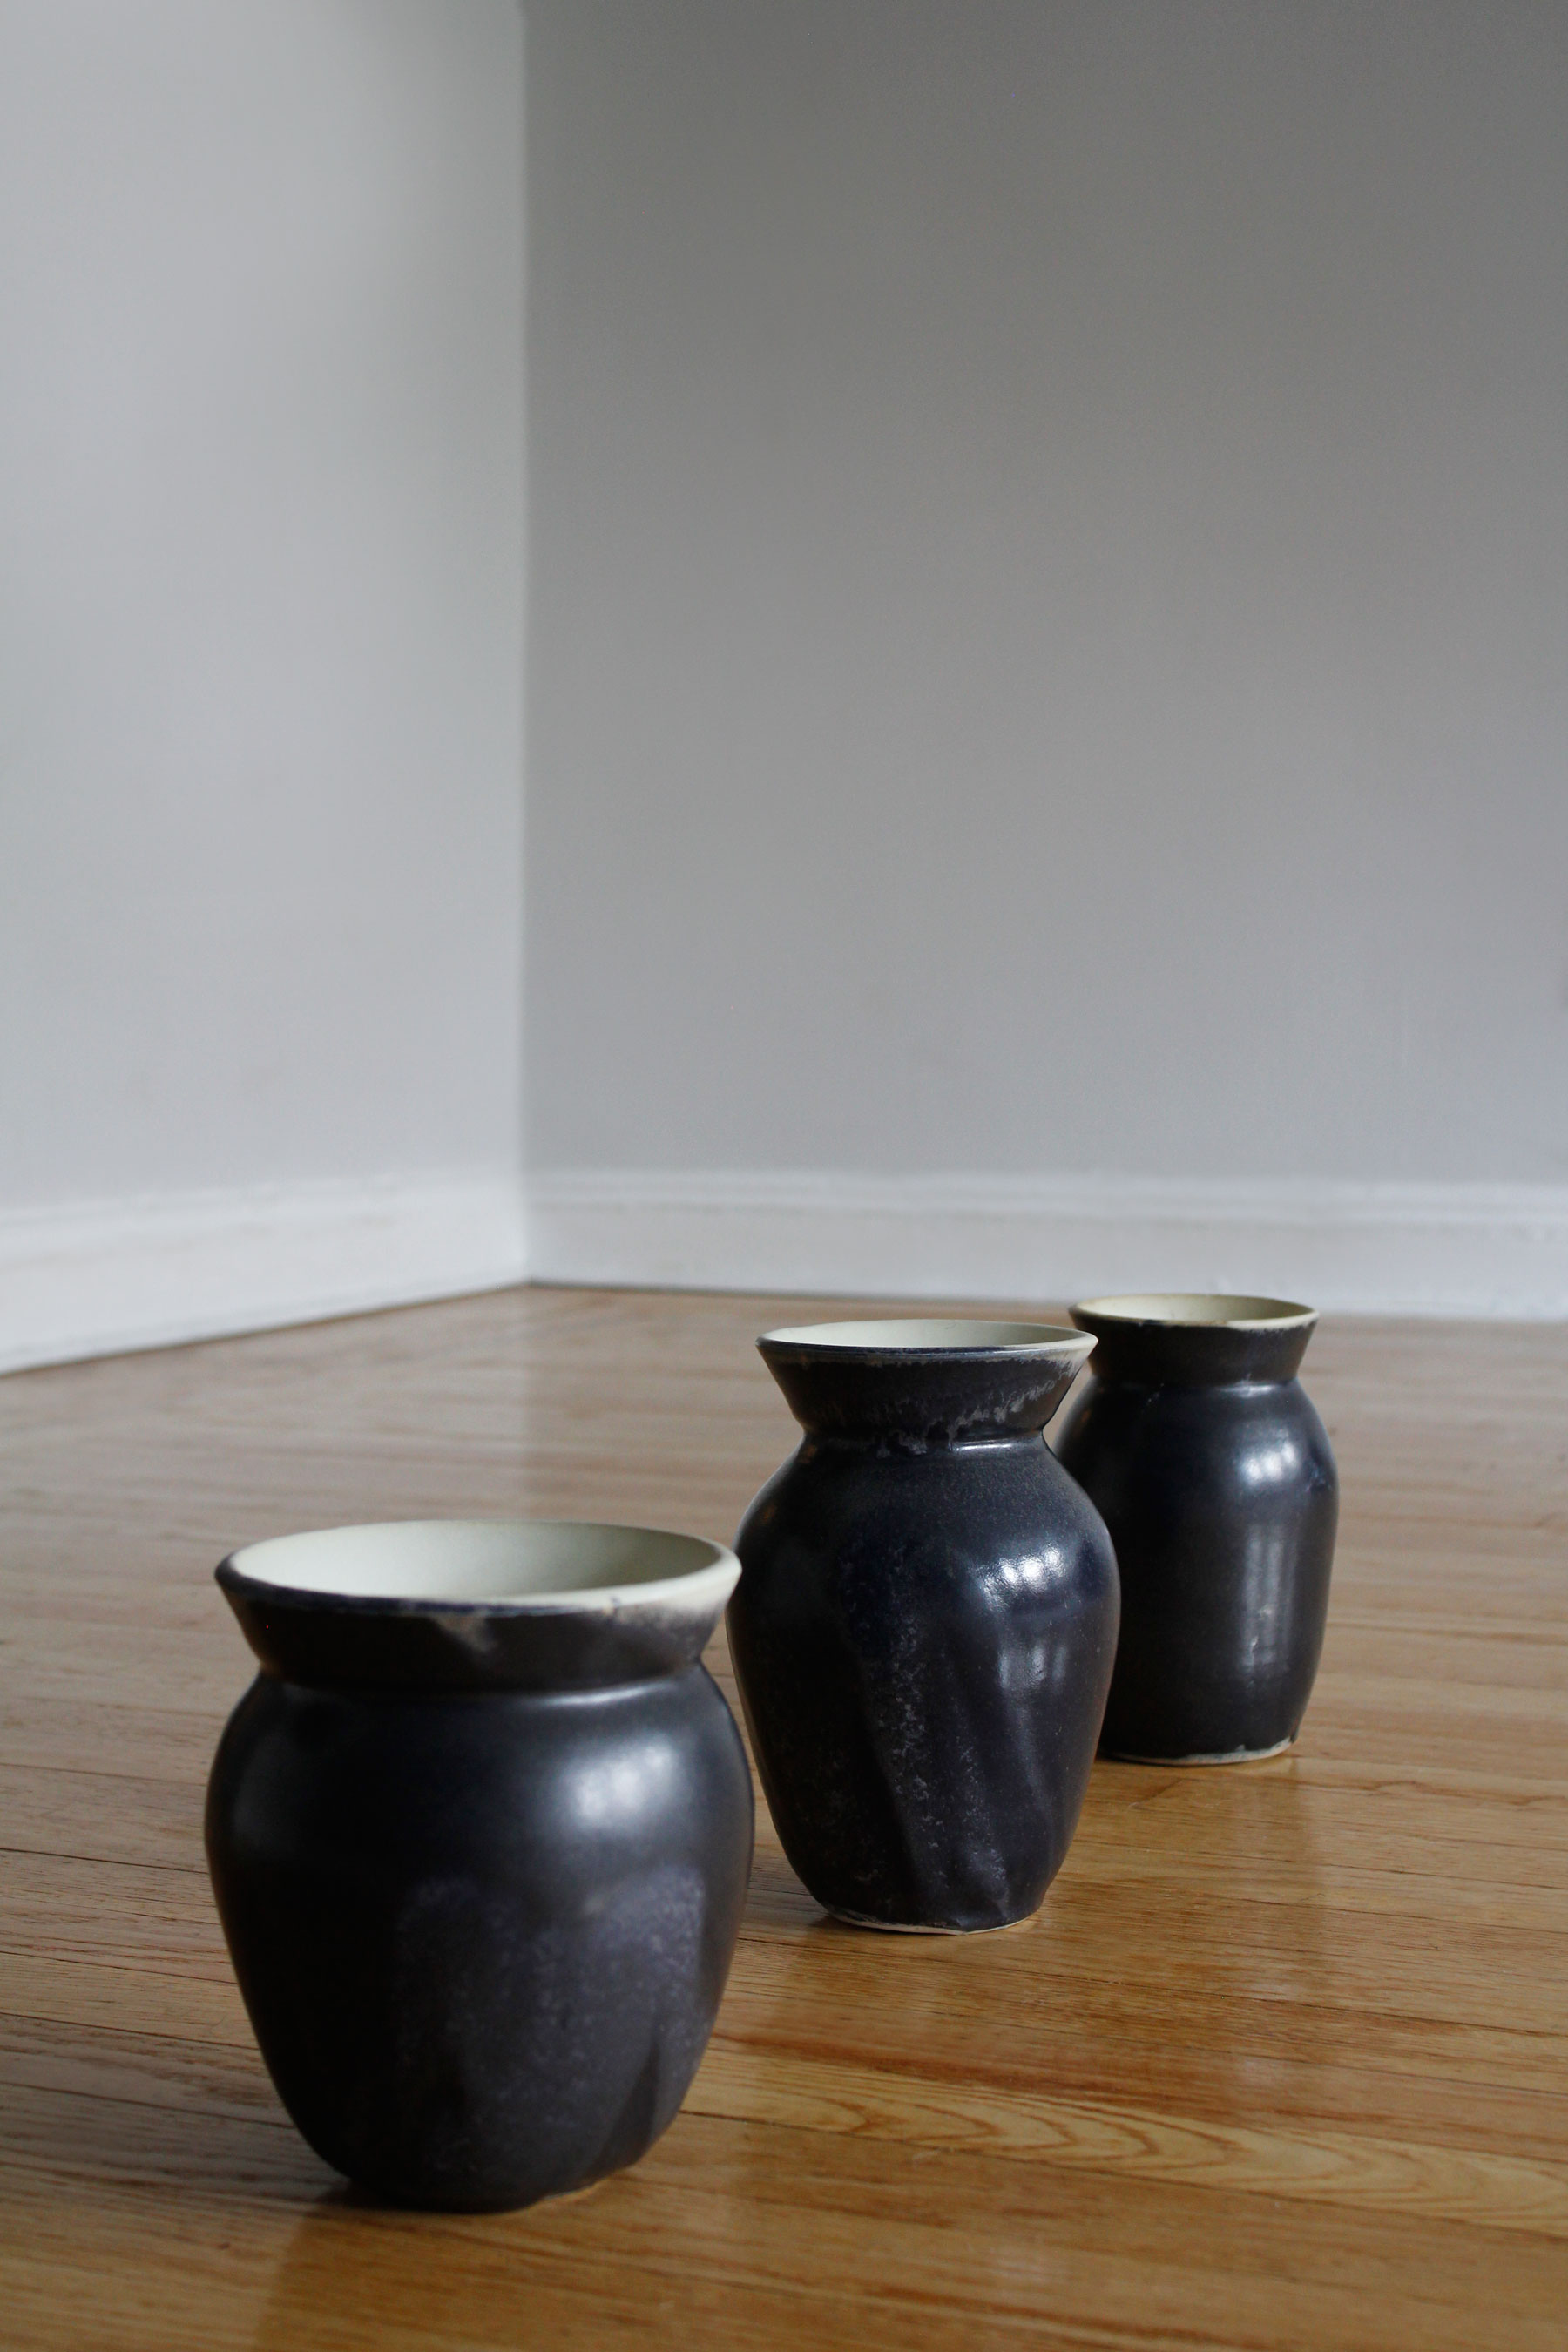 James-Rivas_Decay-Vase-Series_A.jpg